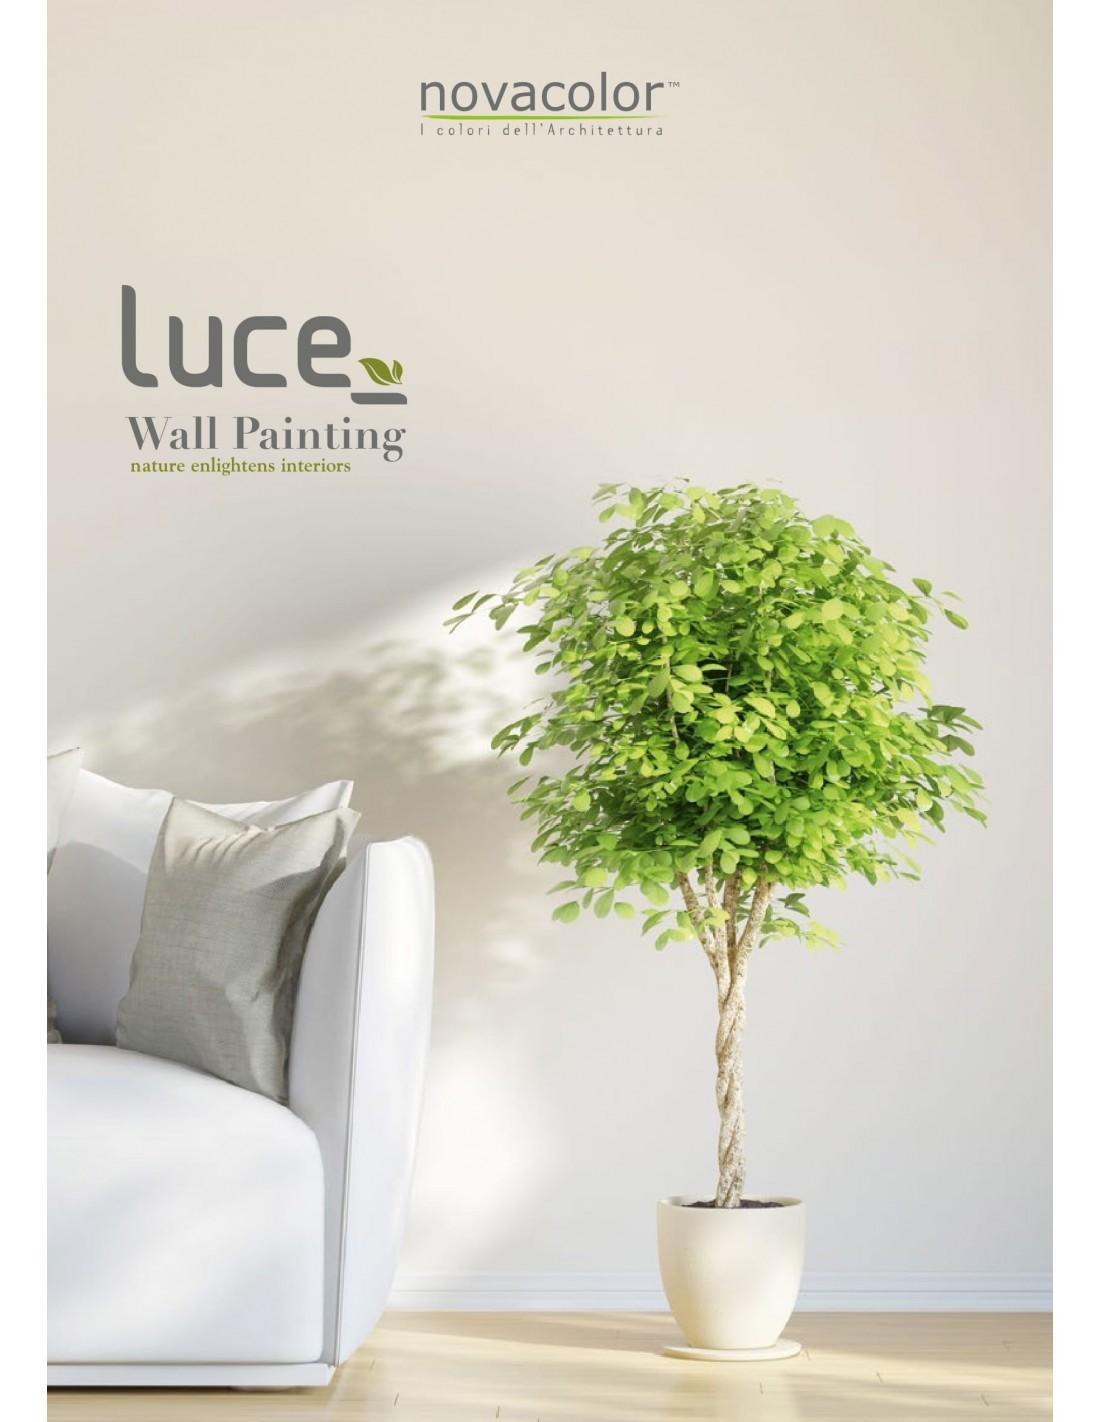 Luce Dekoracyjna Farba Metaliczna Novacolor Sklep I